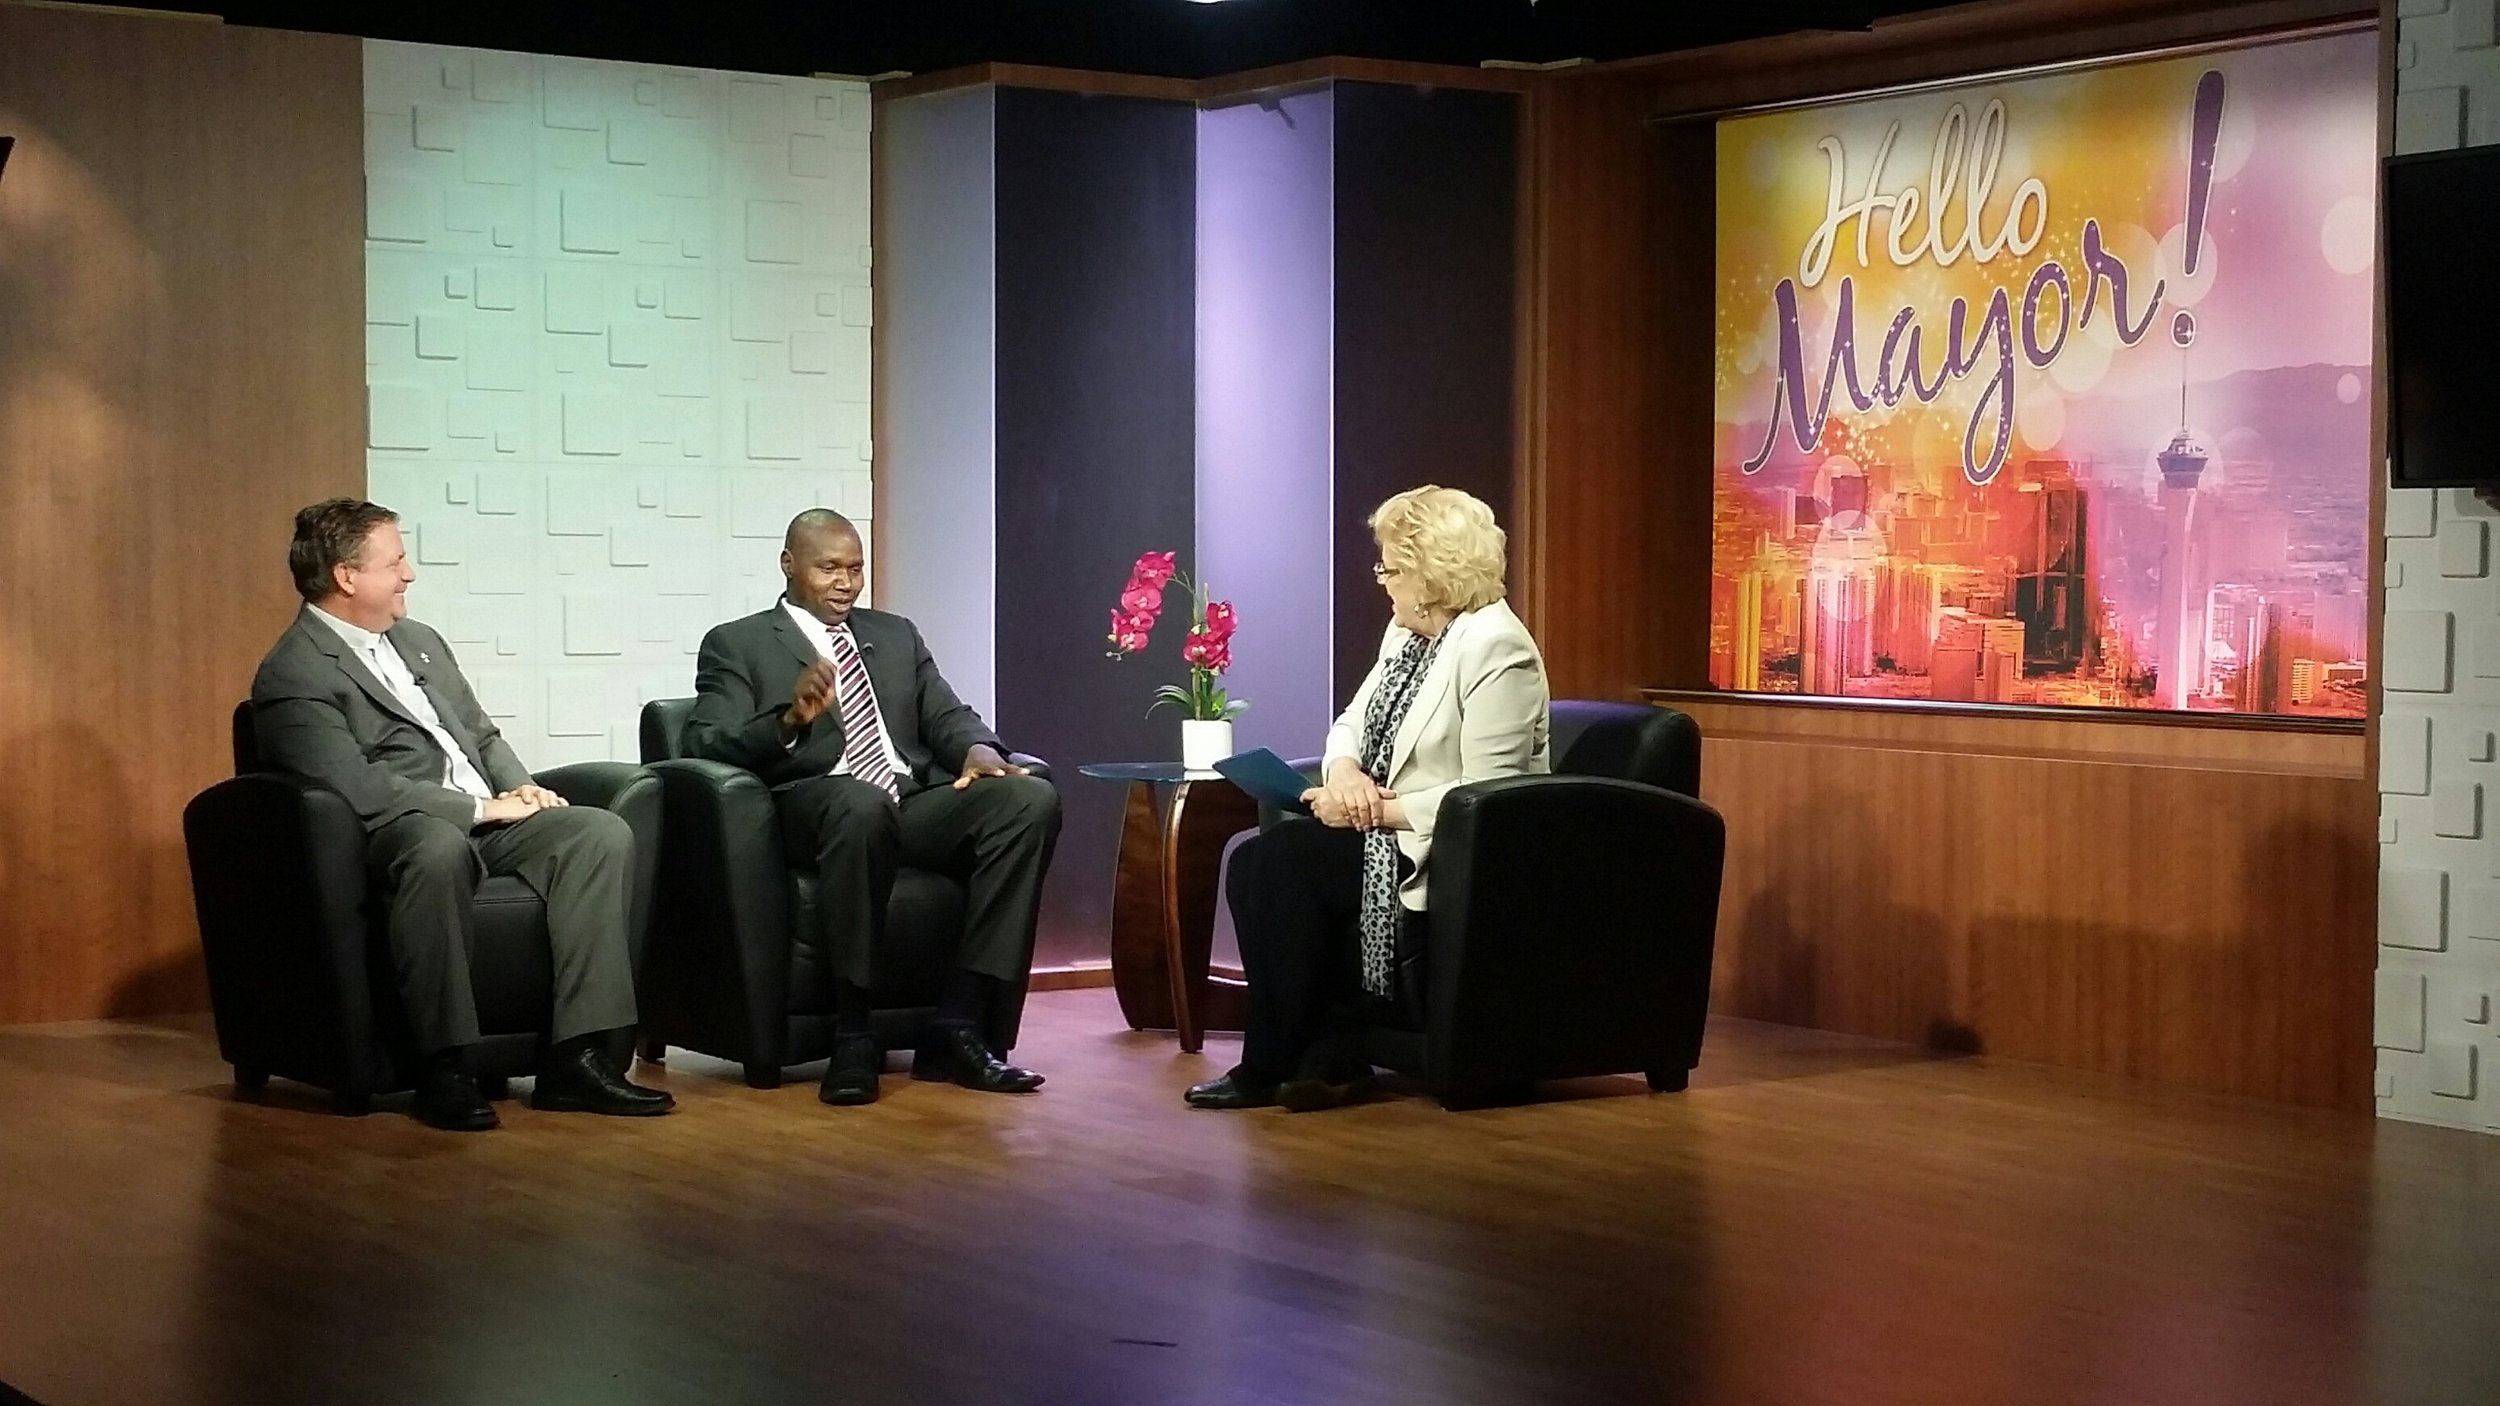 Biar and Catholic Charities President & CEO, Deacon Thomas Roberts on Hello Mayor! TV show with Mayor Carolyn Goodman 5.9.16